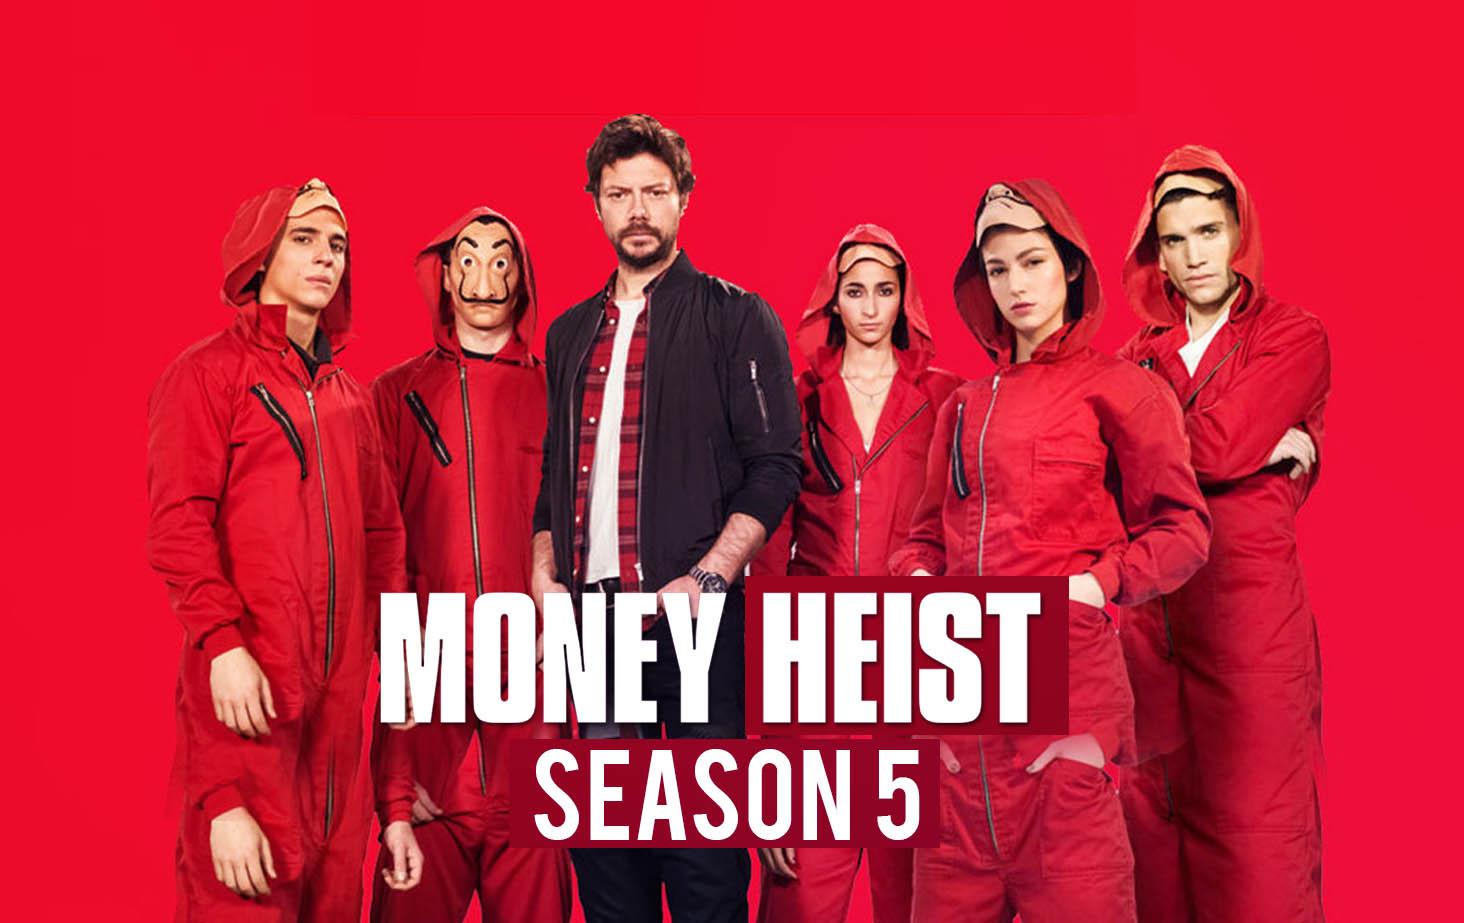 If Money Heist Season 5 is the last season